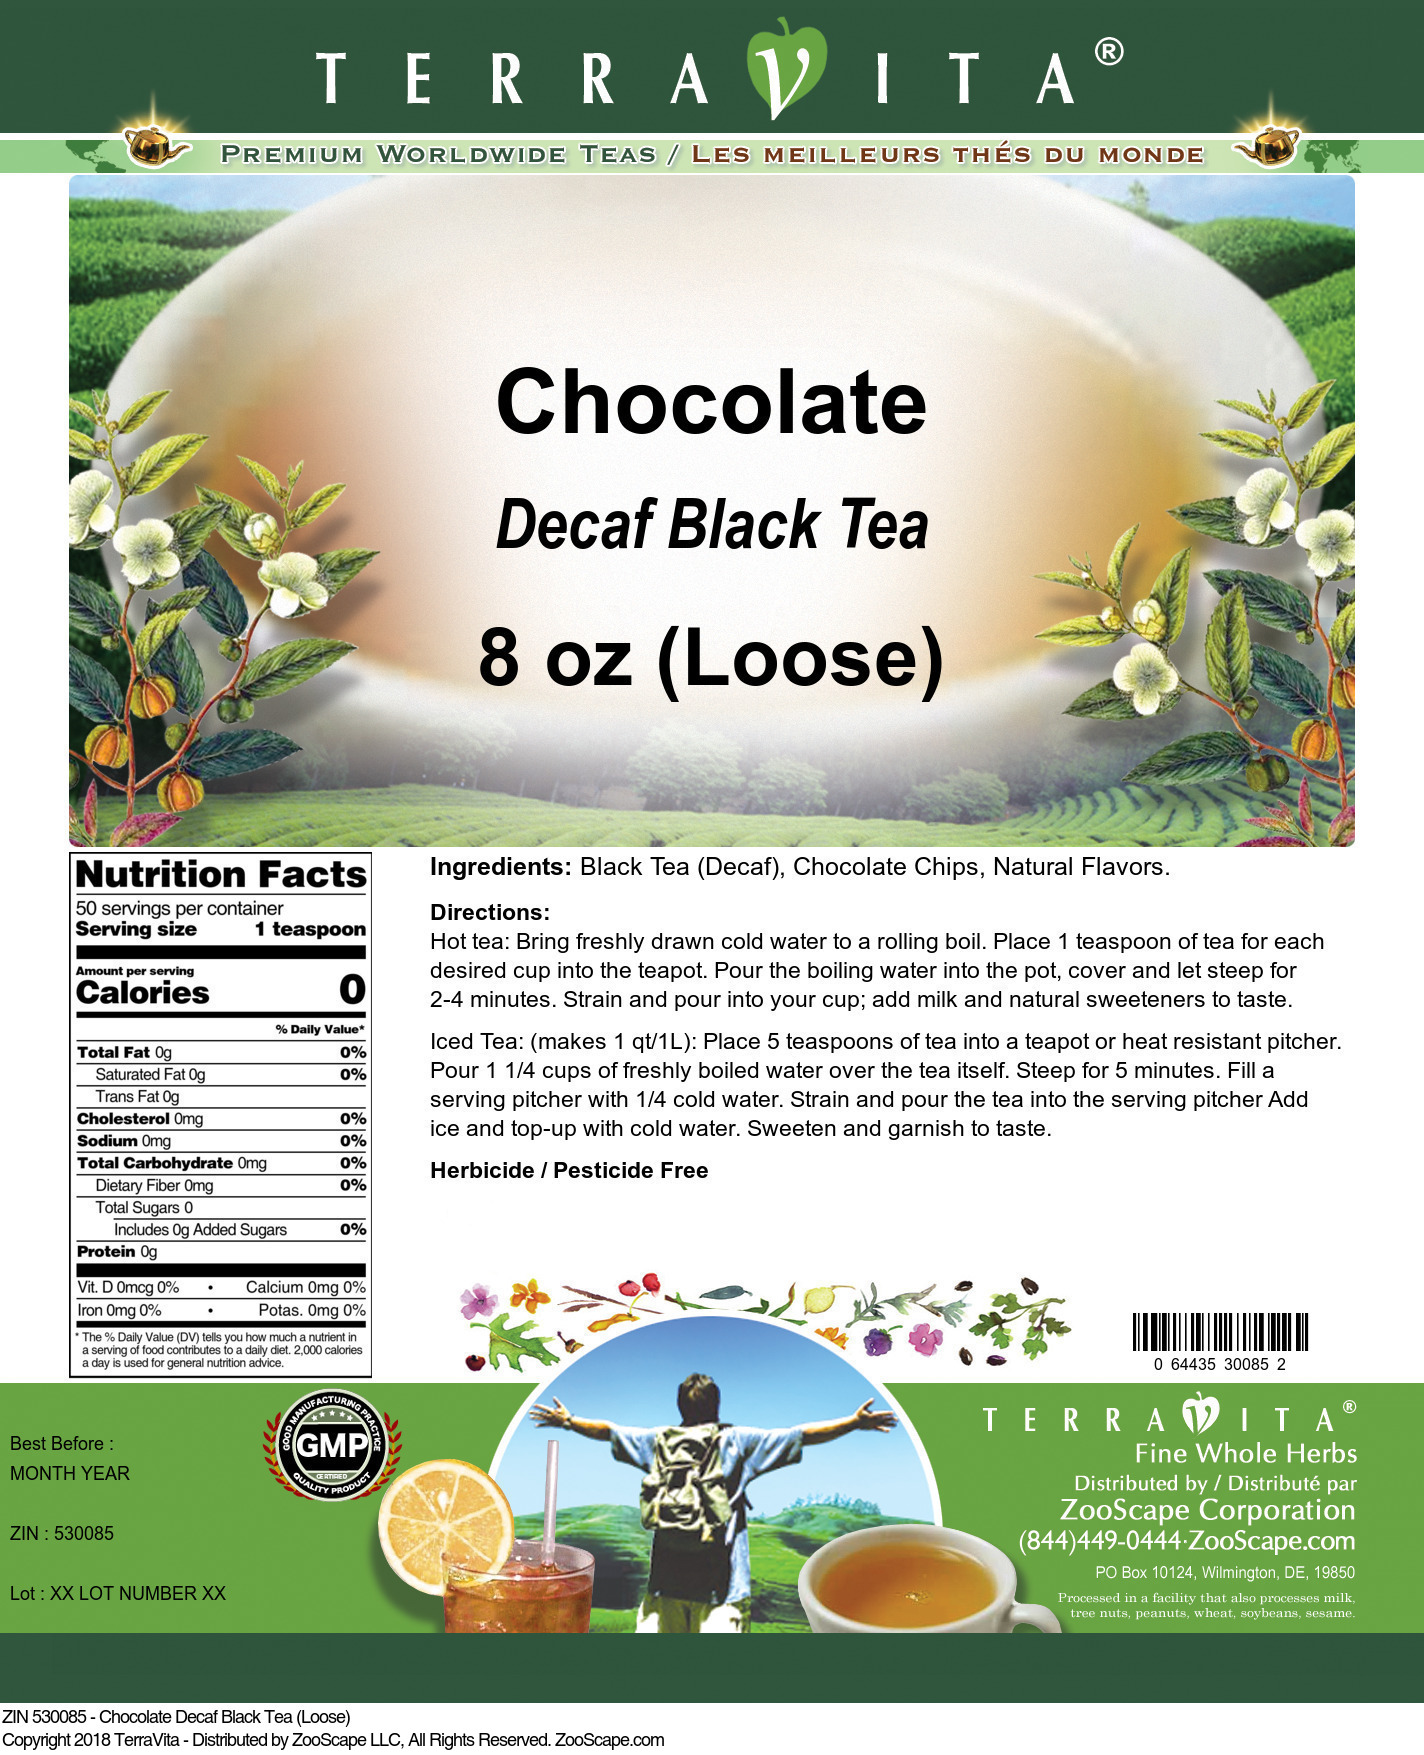 Chocolate Decaf Black Tea (Loose)